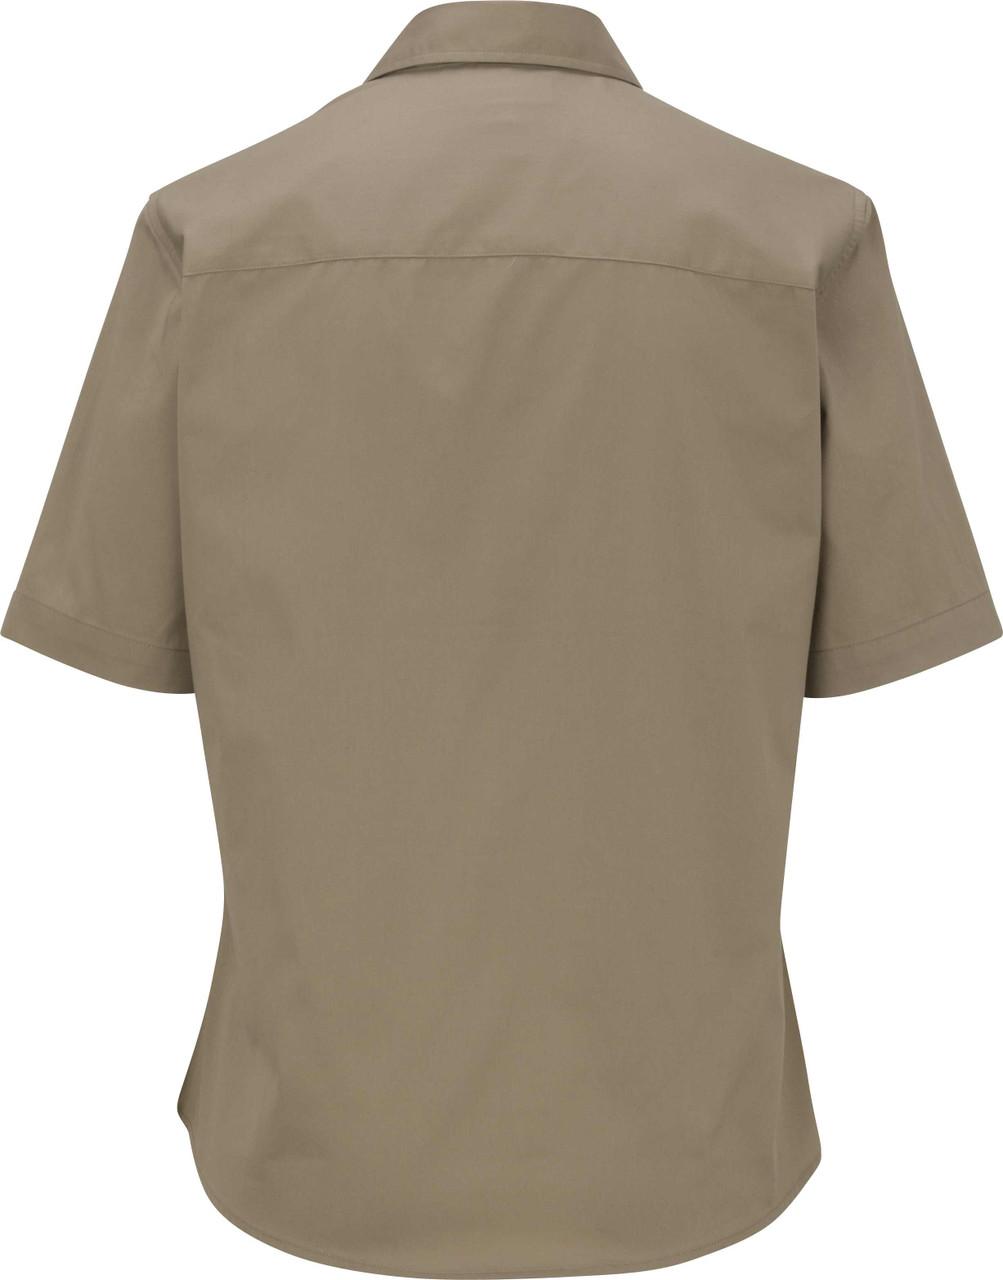 Women's Short Sleeve Teflon Twill Uniform Shirt